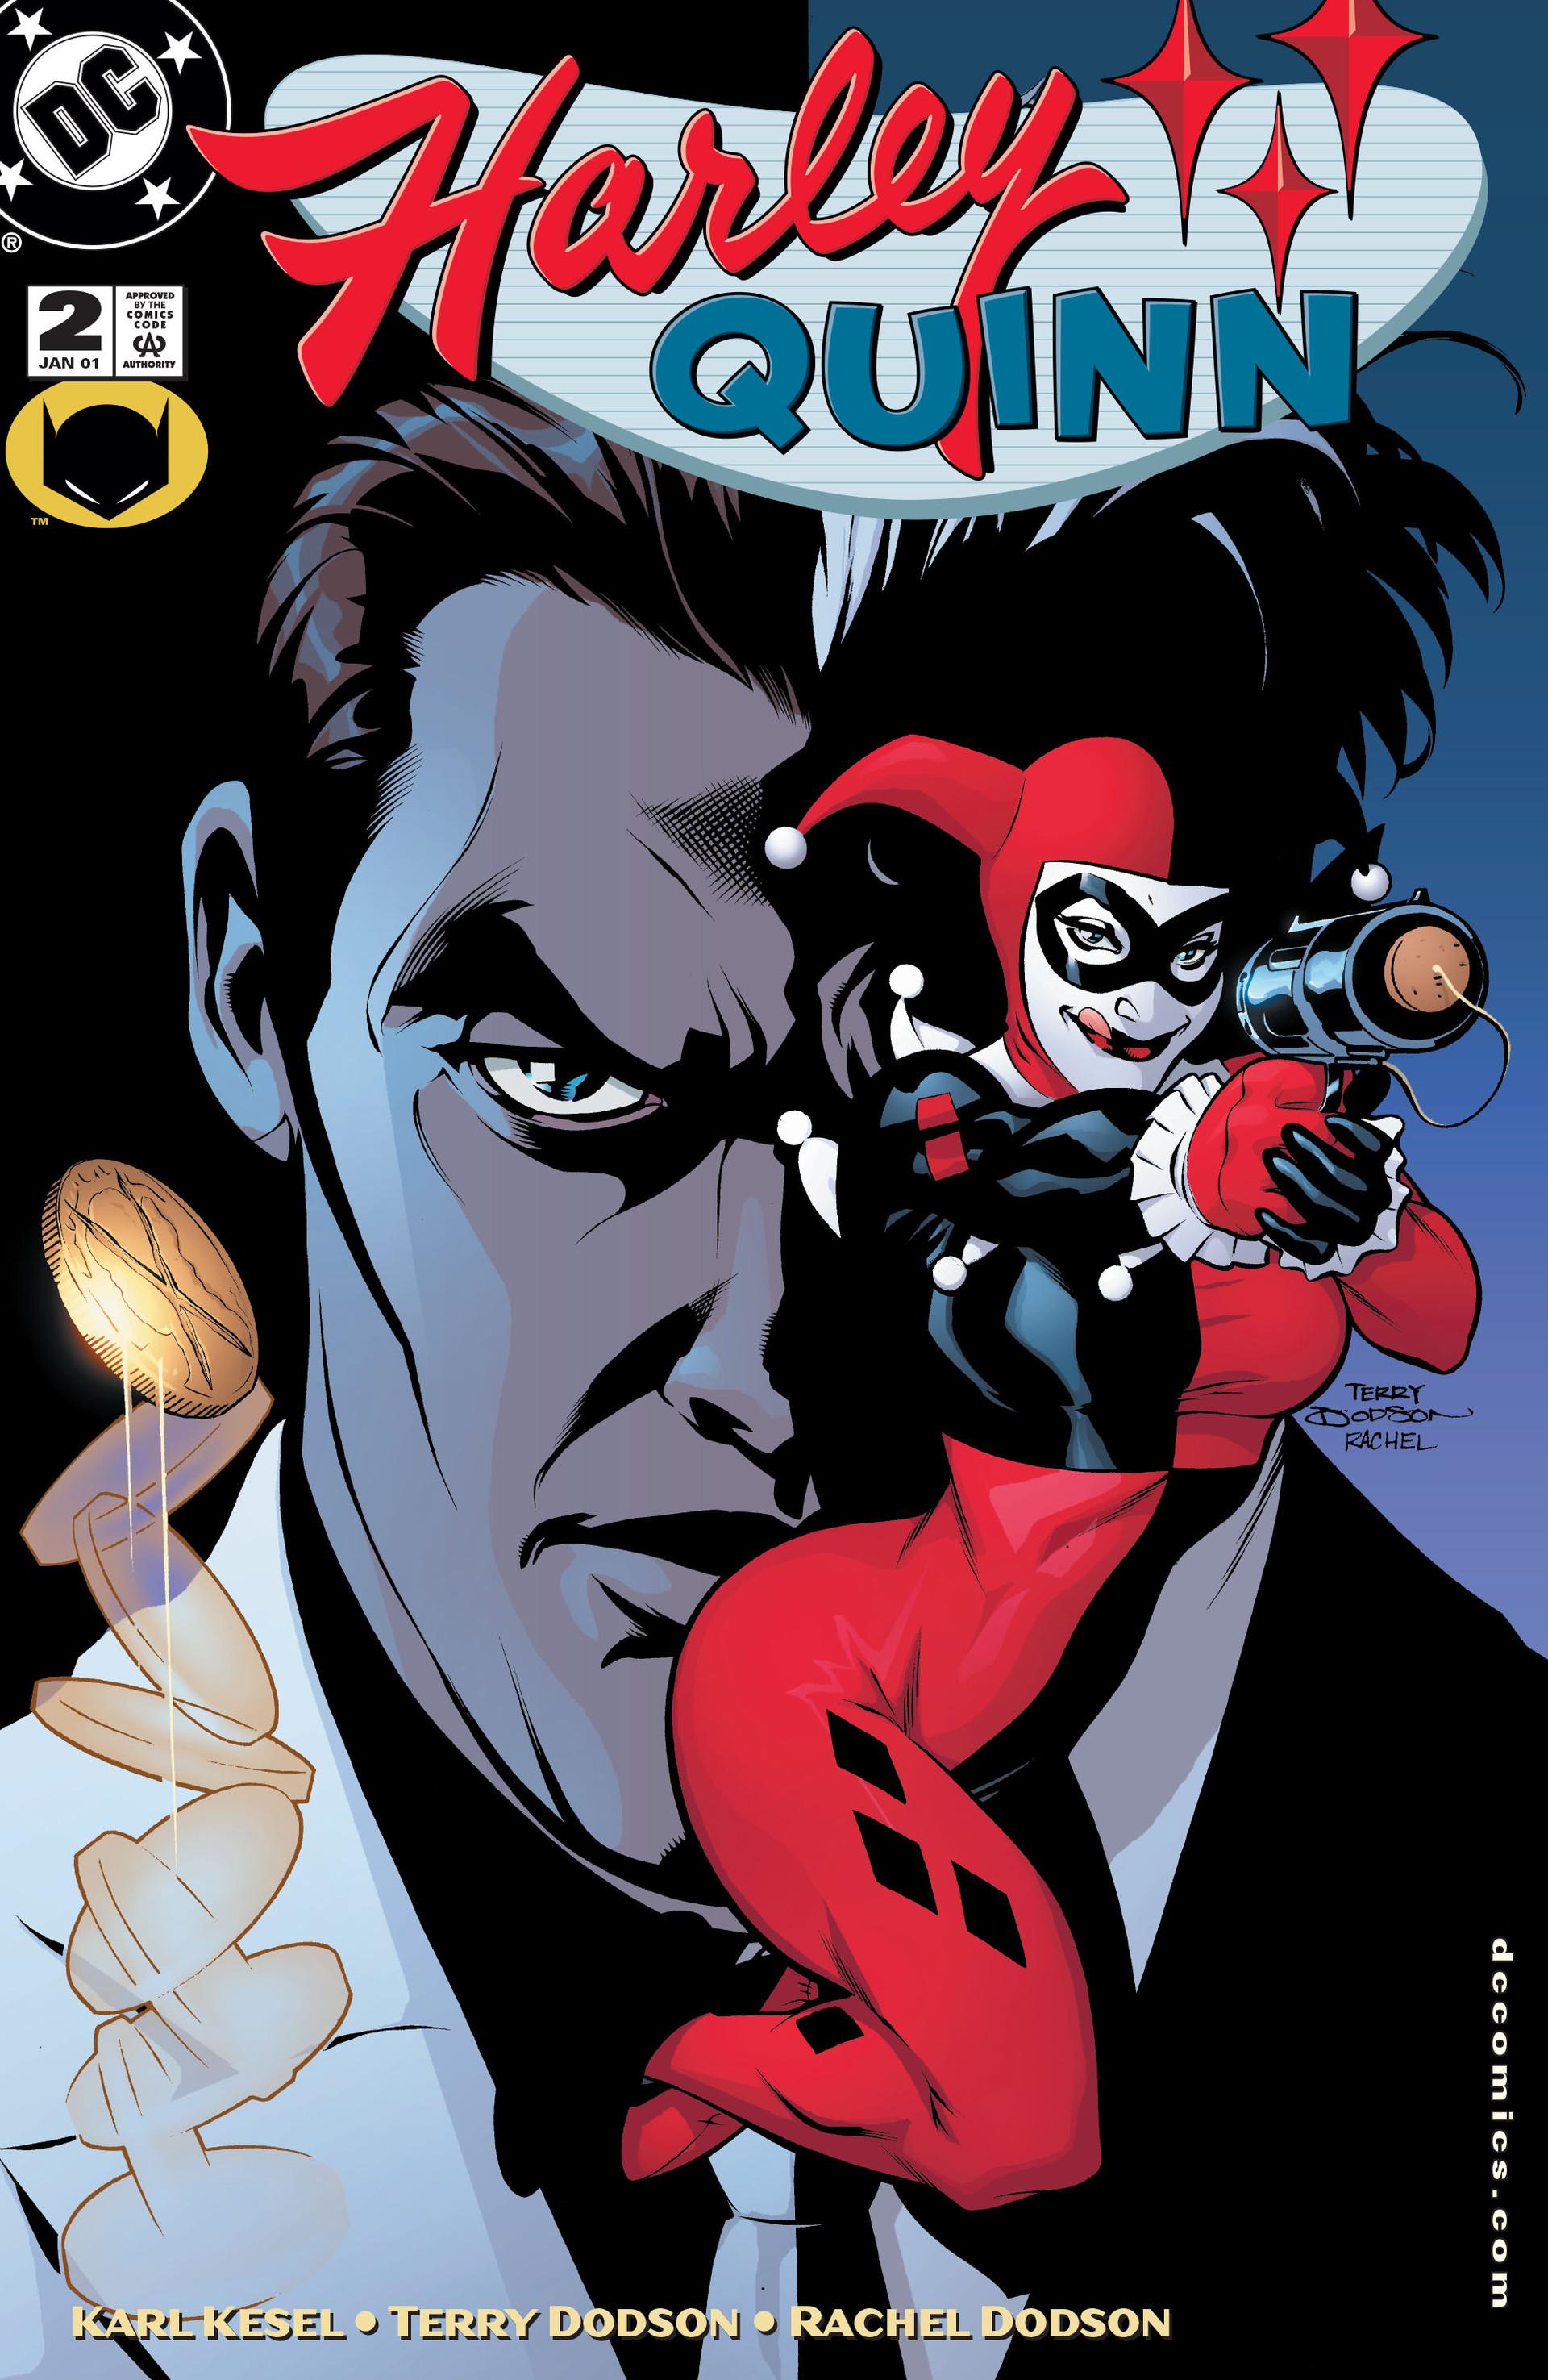 Harley Quinn Vol.1 #2